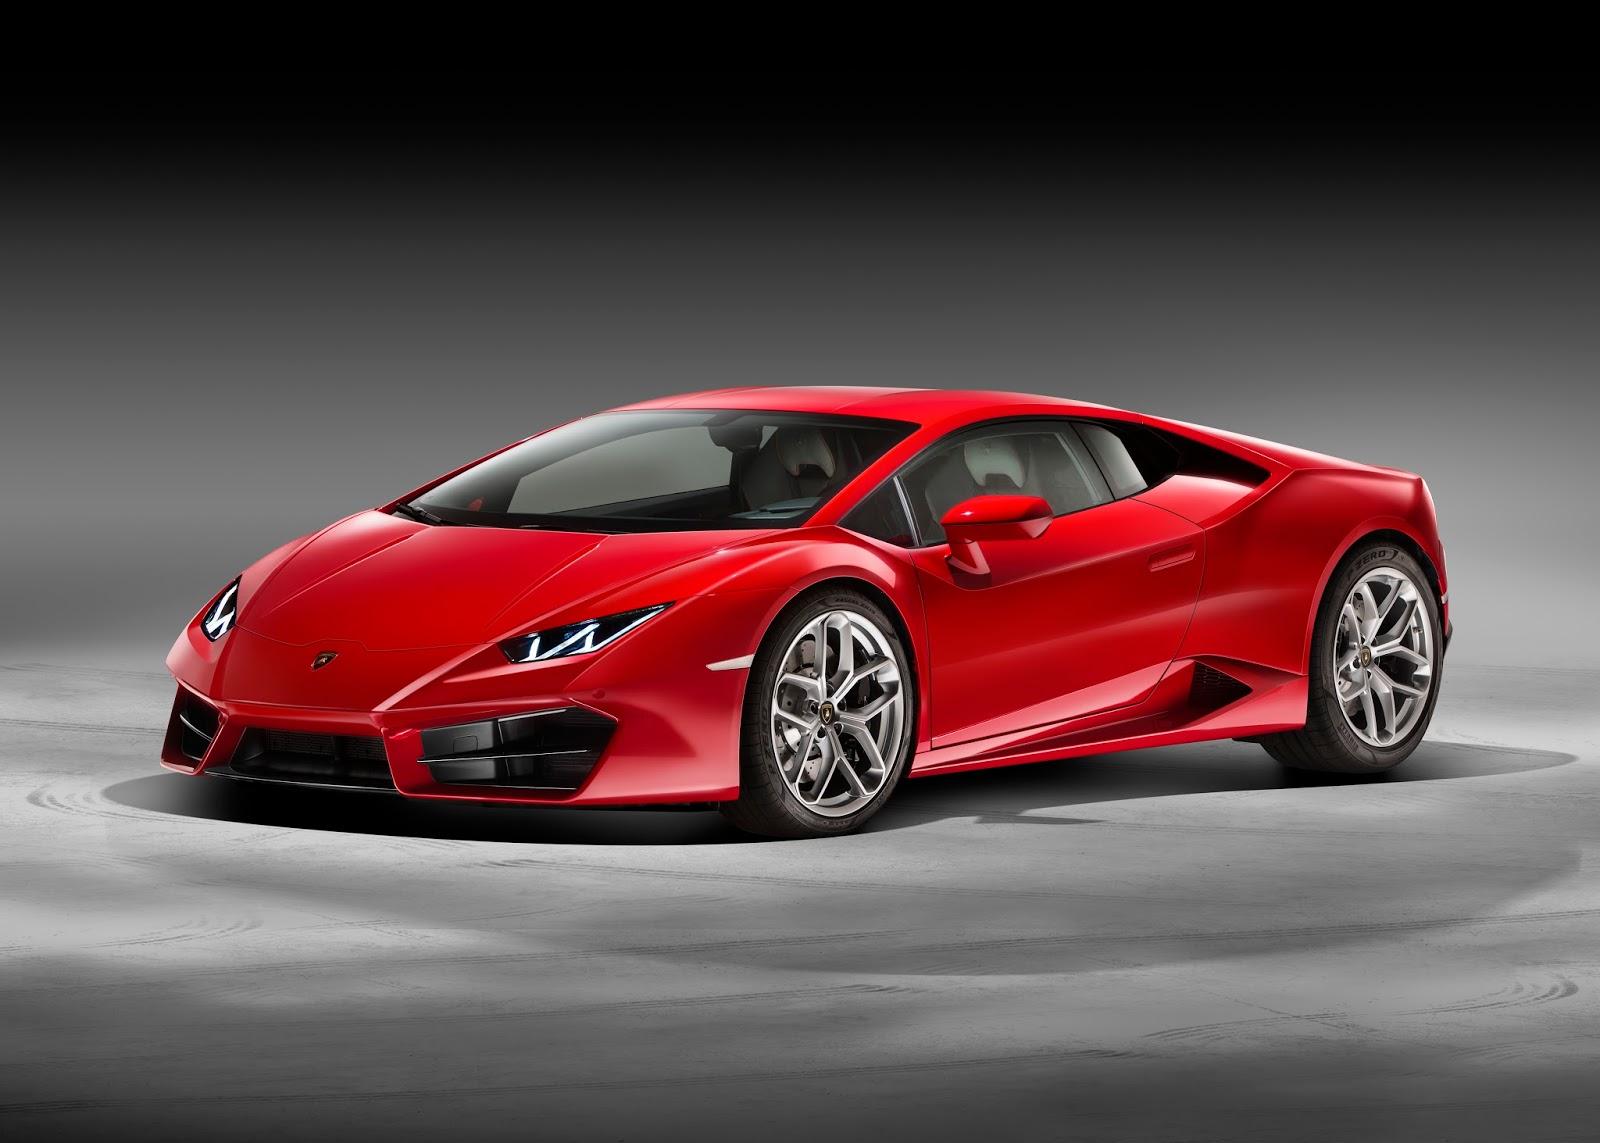 409533 Lamborghini Huracan LP580-2 : Η πιο fun to drive Lamborghini είναι πισωκίνητη και η φθηνότερη Lamborghini, Lamborghini Huracan, Lamborghini Huracan LP580-2, supercars, videos